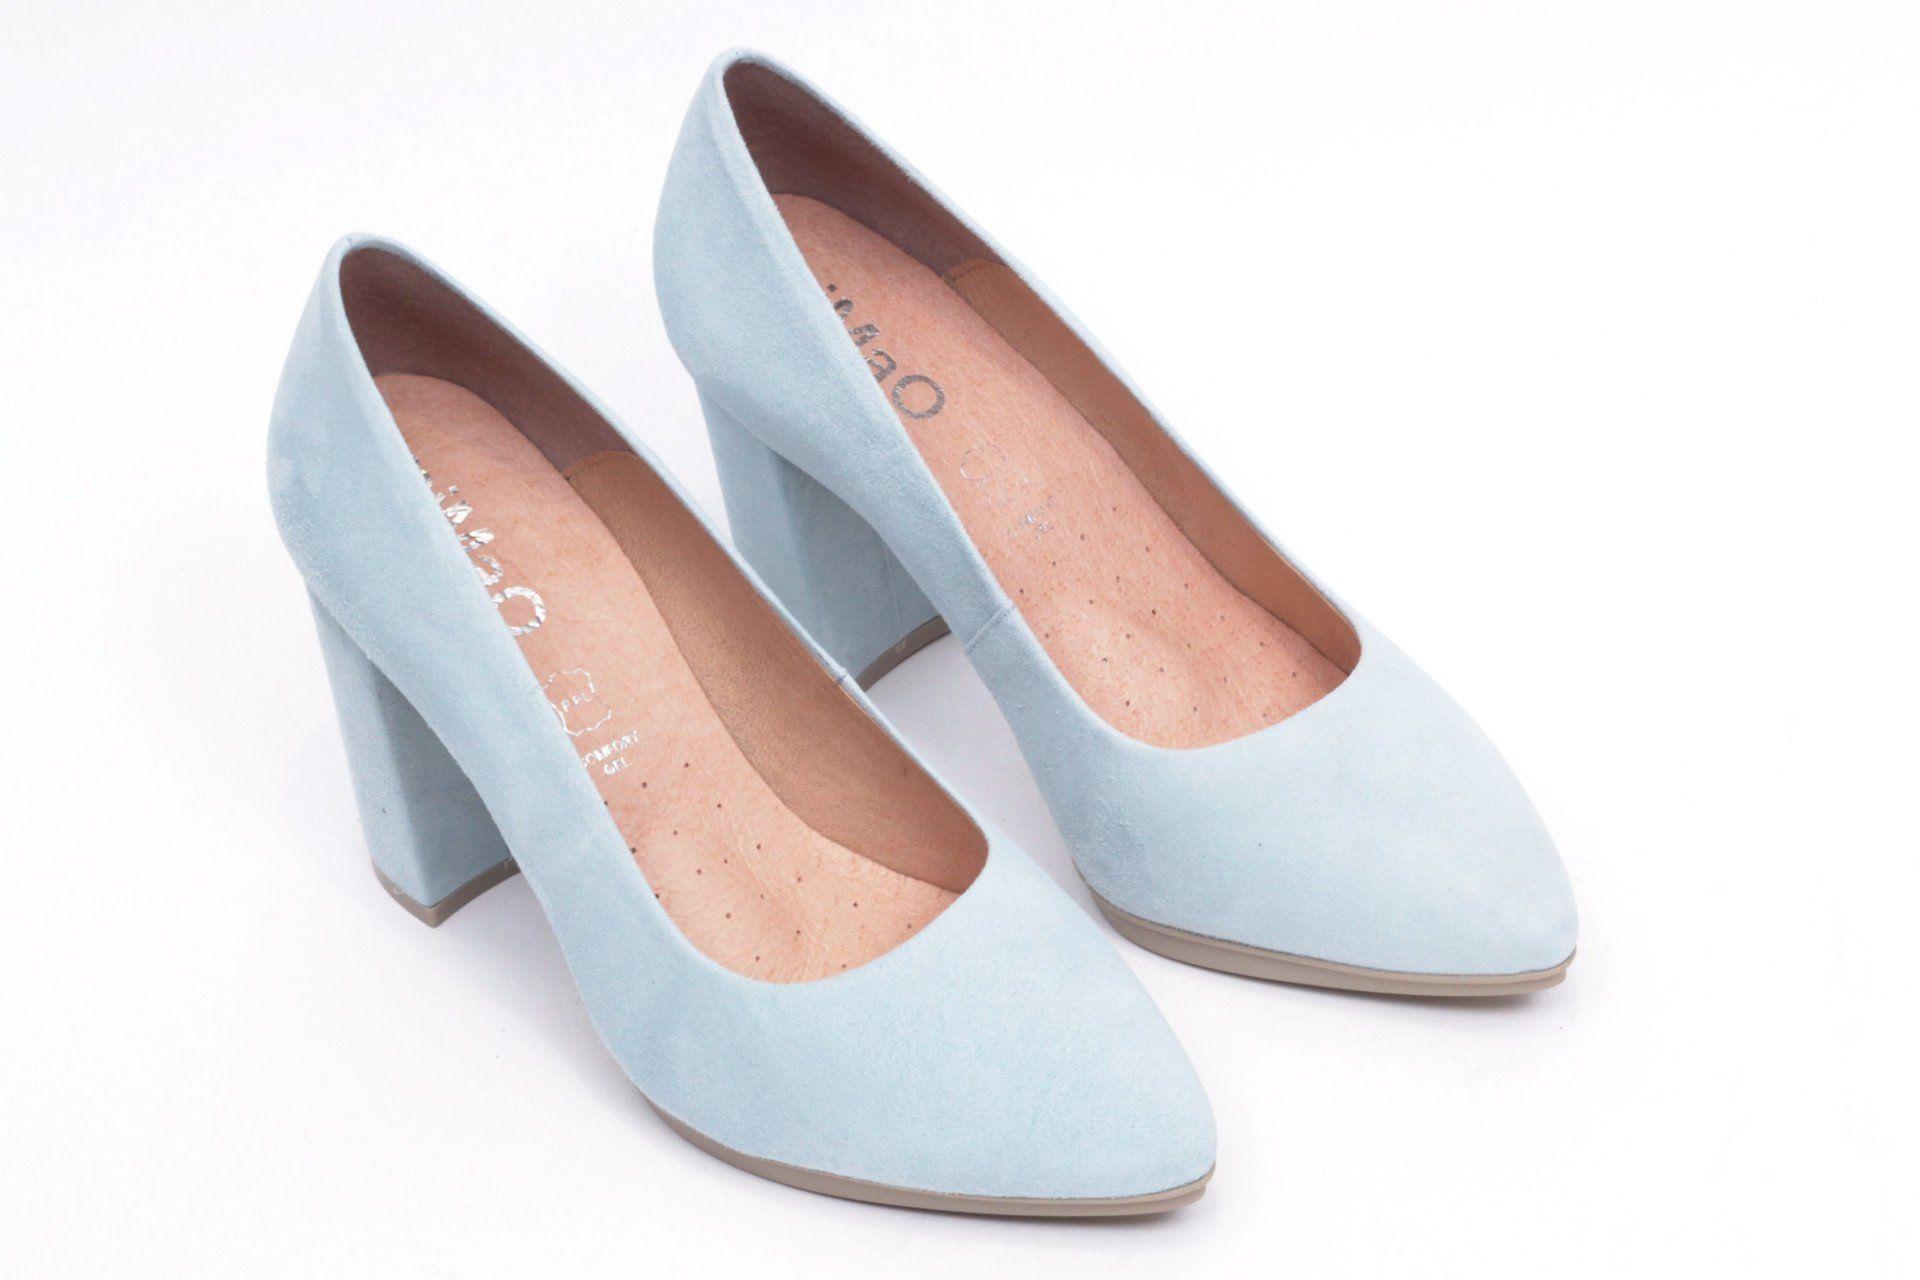 f0e61fa7 miMaO Urban Azul Bebé – Zapato mujer de tacon salones azul vestir cómodo -  women high